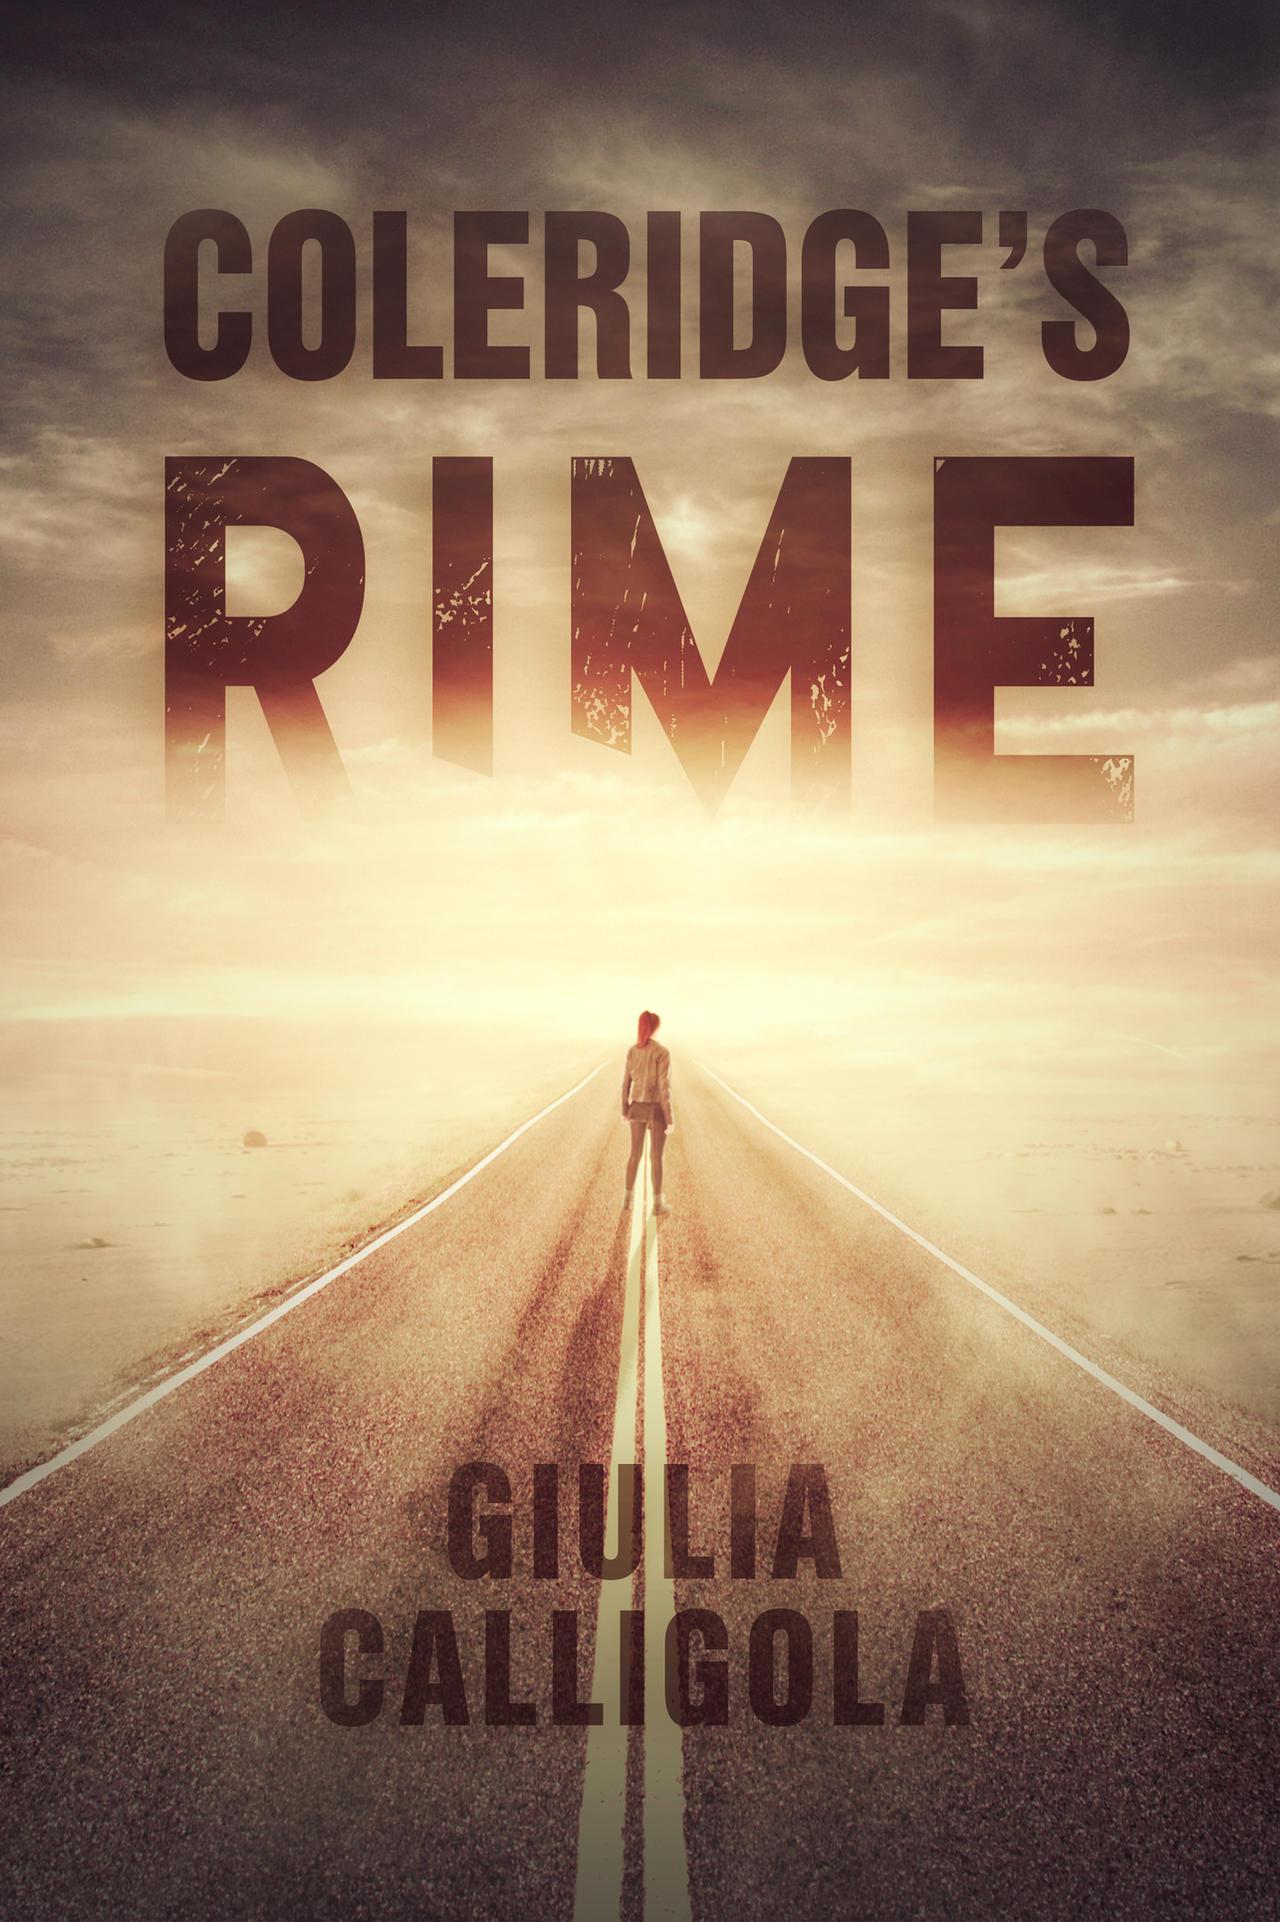 Coleridge's Rime